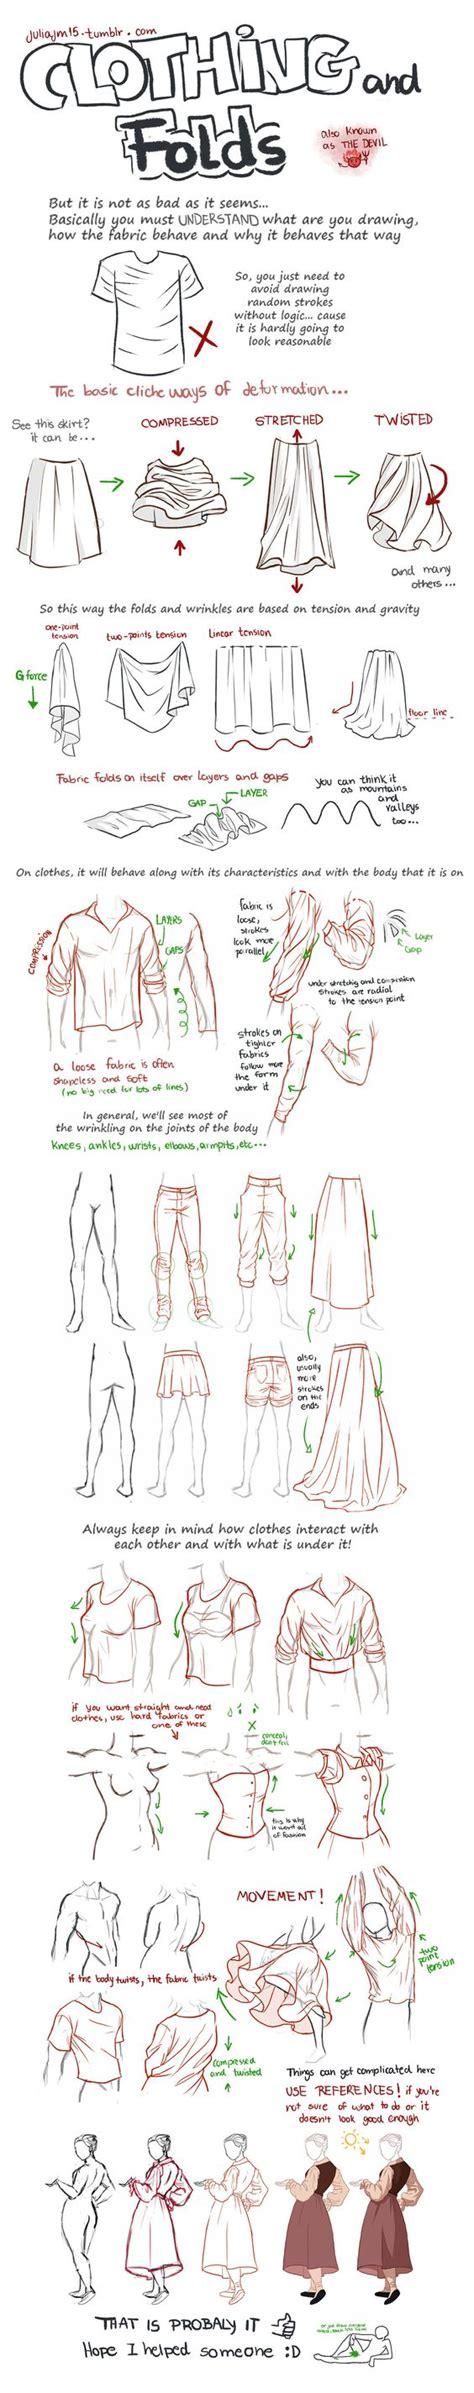 typography tutorial deviantart clothing and folds tutorial by juliajm15 on deviantart